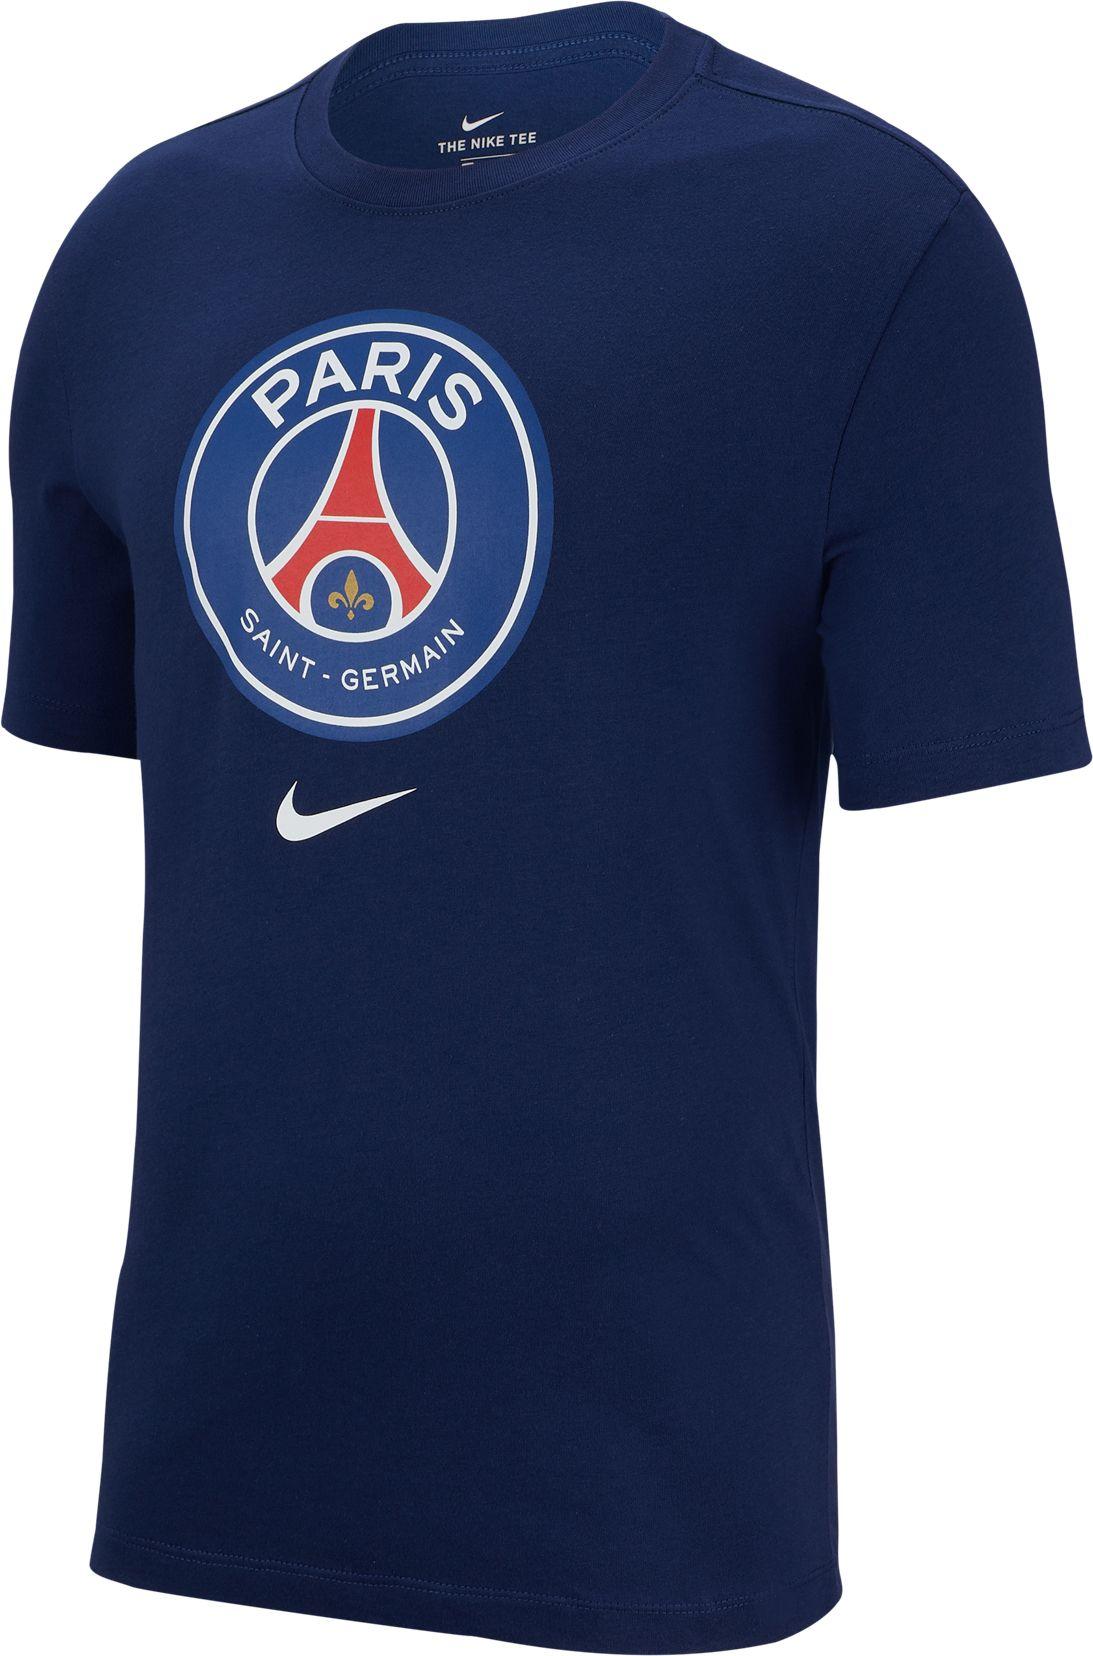 Nike Men's Paris Saint-Germain Crest Navy